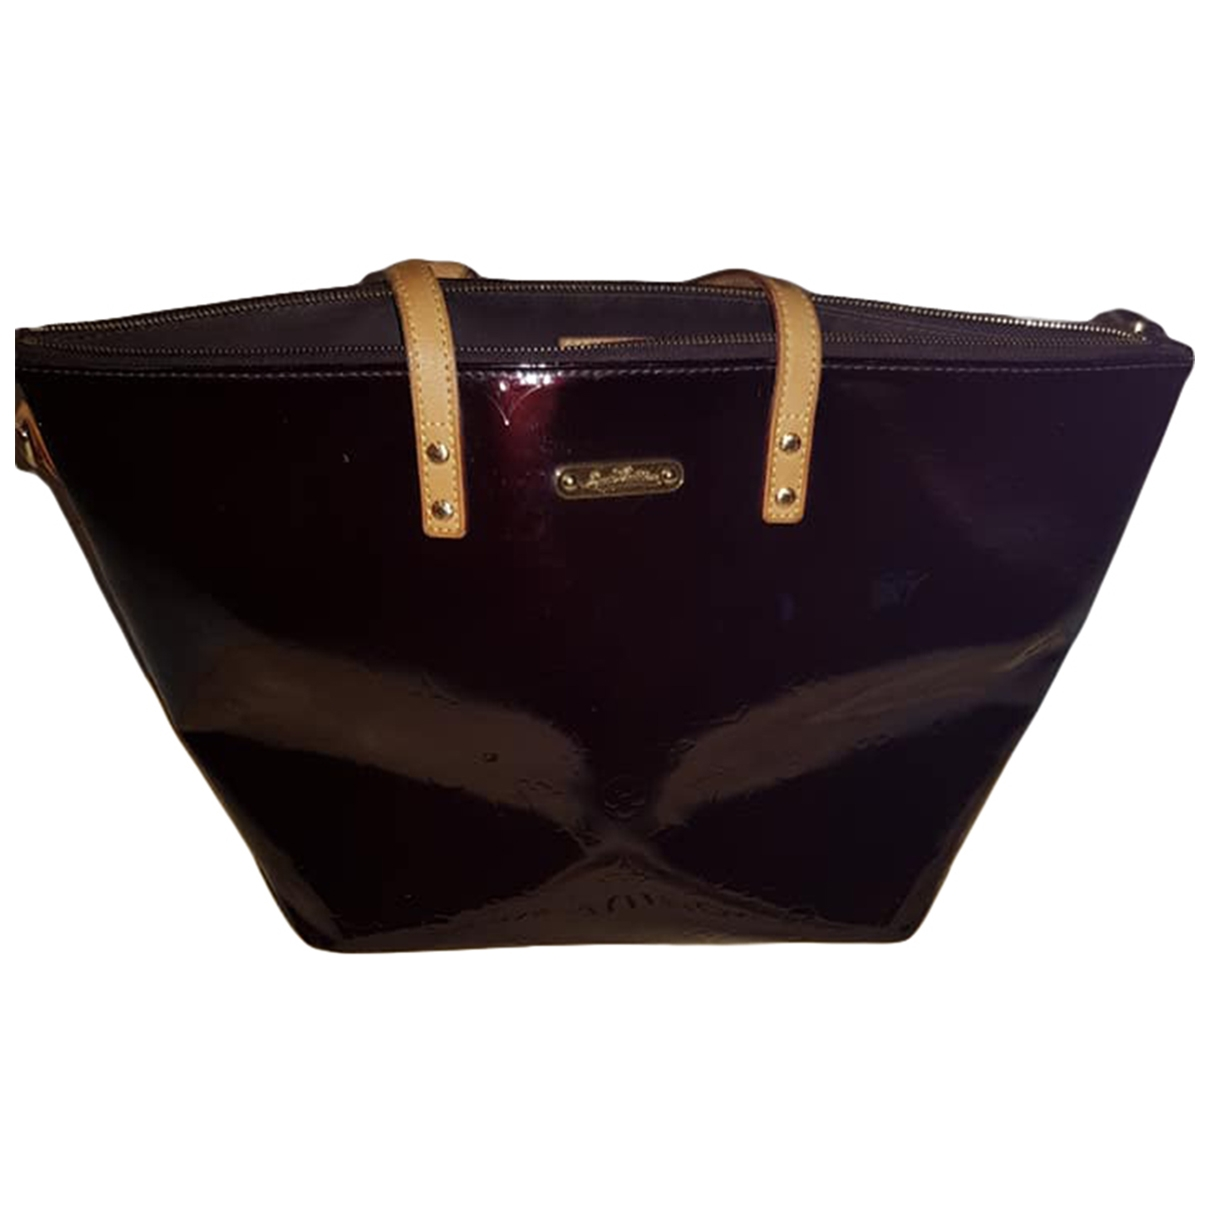 Louis Vuitton Bellevue Handtasche in  Bordeauxrot Lackleder